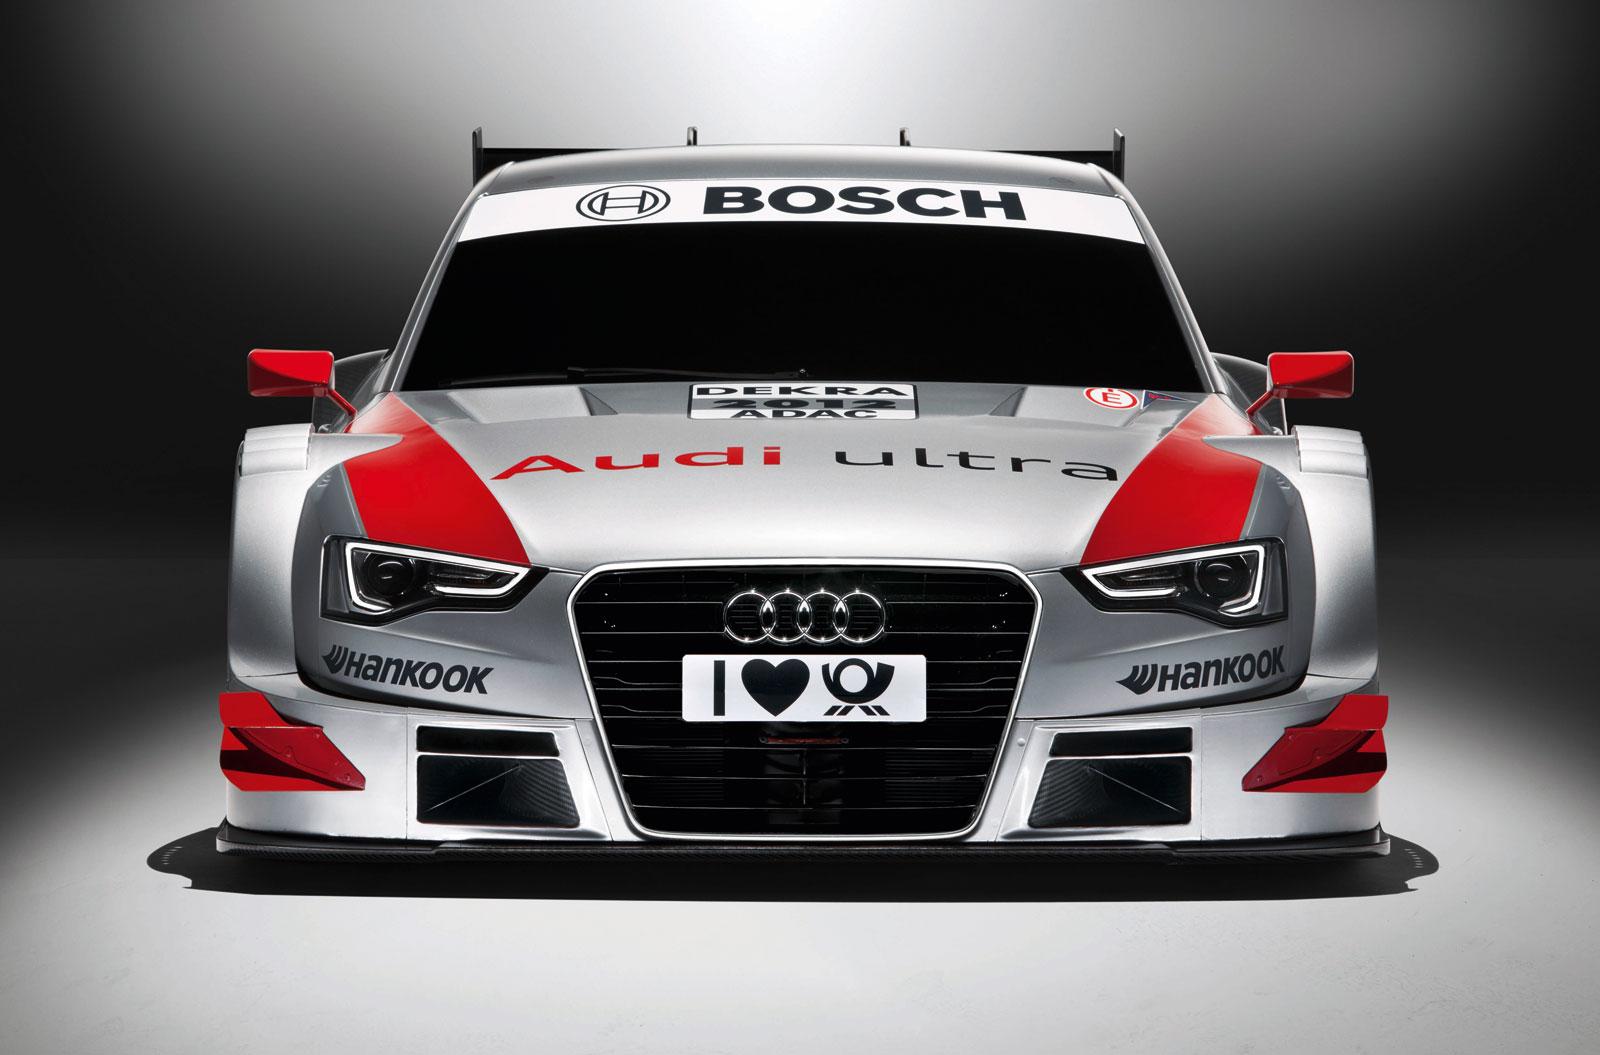 http://4.bp.blogspot.com/-X1HFMHULIgY/T-CdEyuQ47I/AAAAAAAADmo/oowAgFrNJHc/s1600/Audi+A5+DTM+Race+Car+hd+Wallpapers+2012_3.jpg